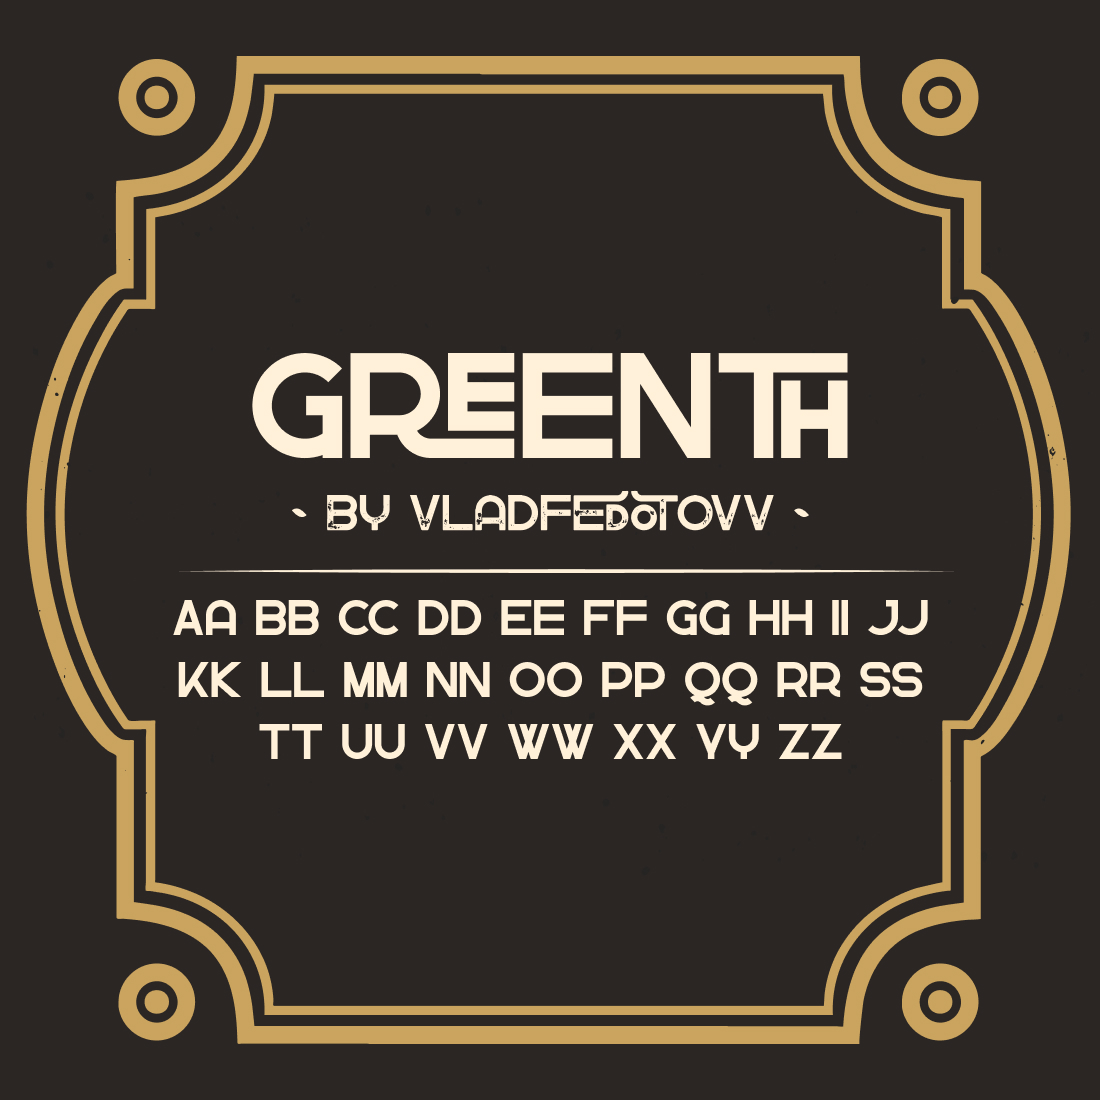 Greenth Display Latin Cyrillic Font preview image.